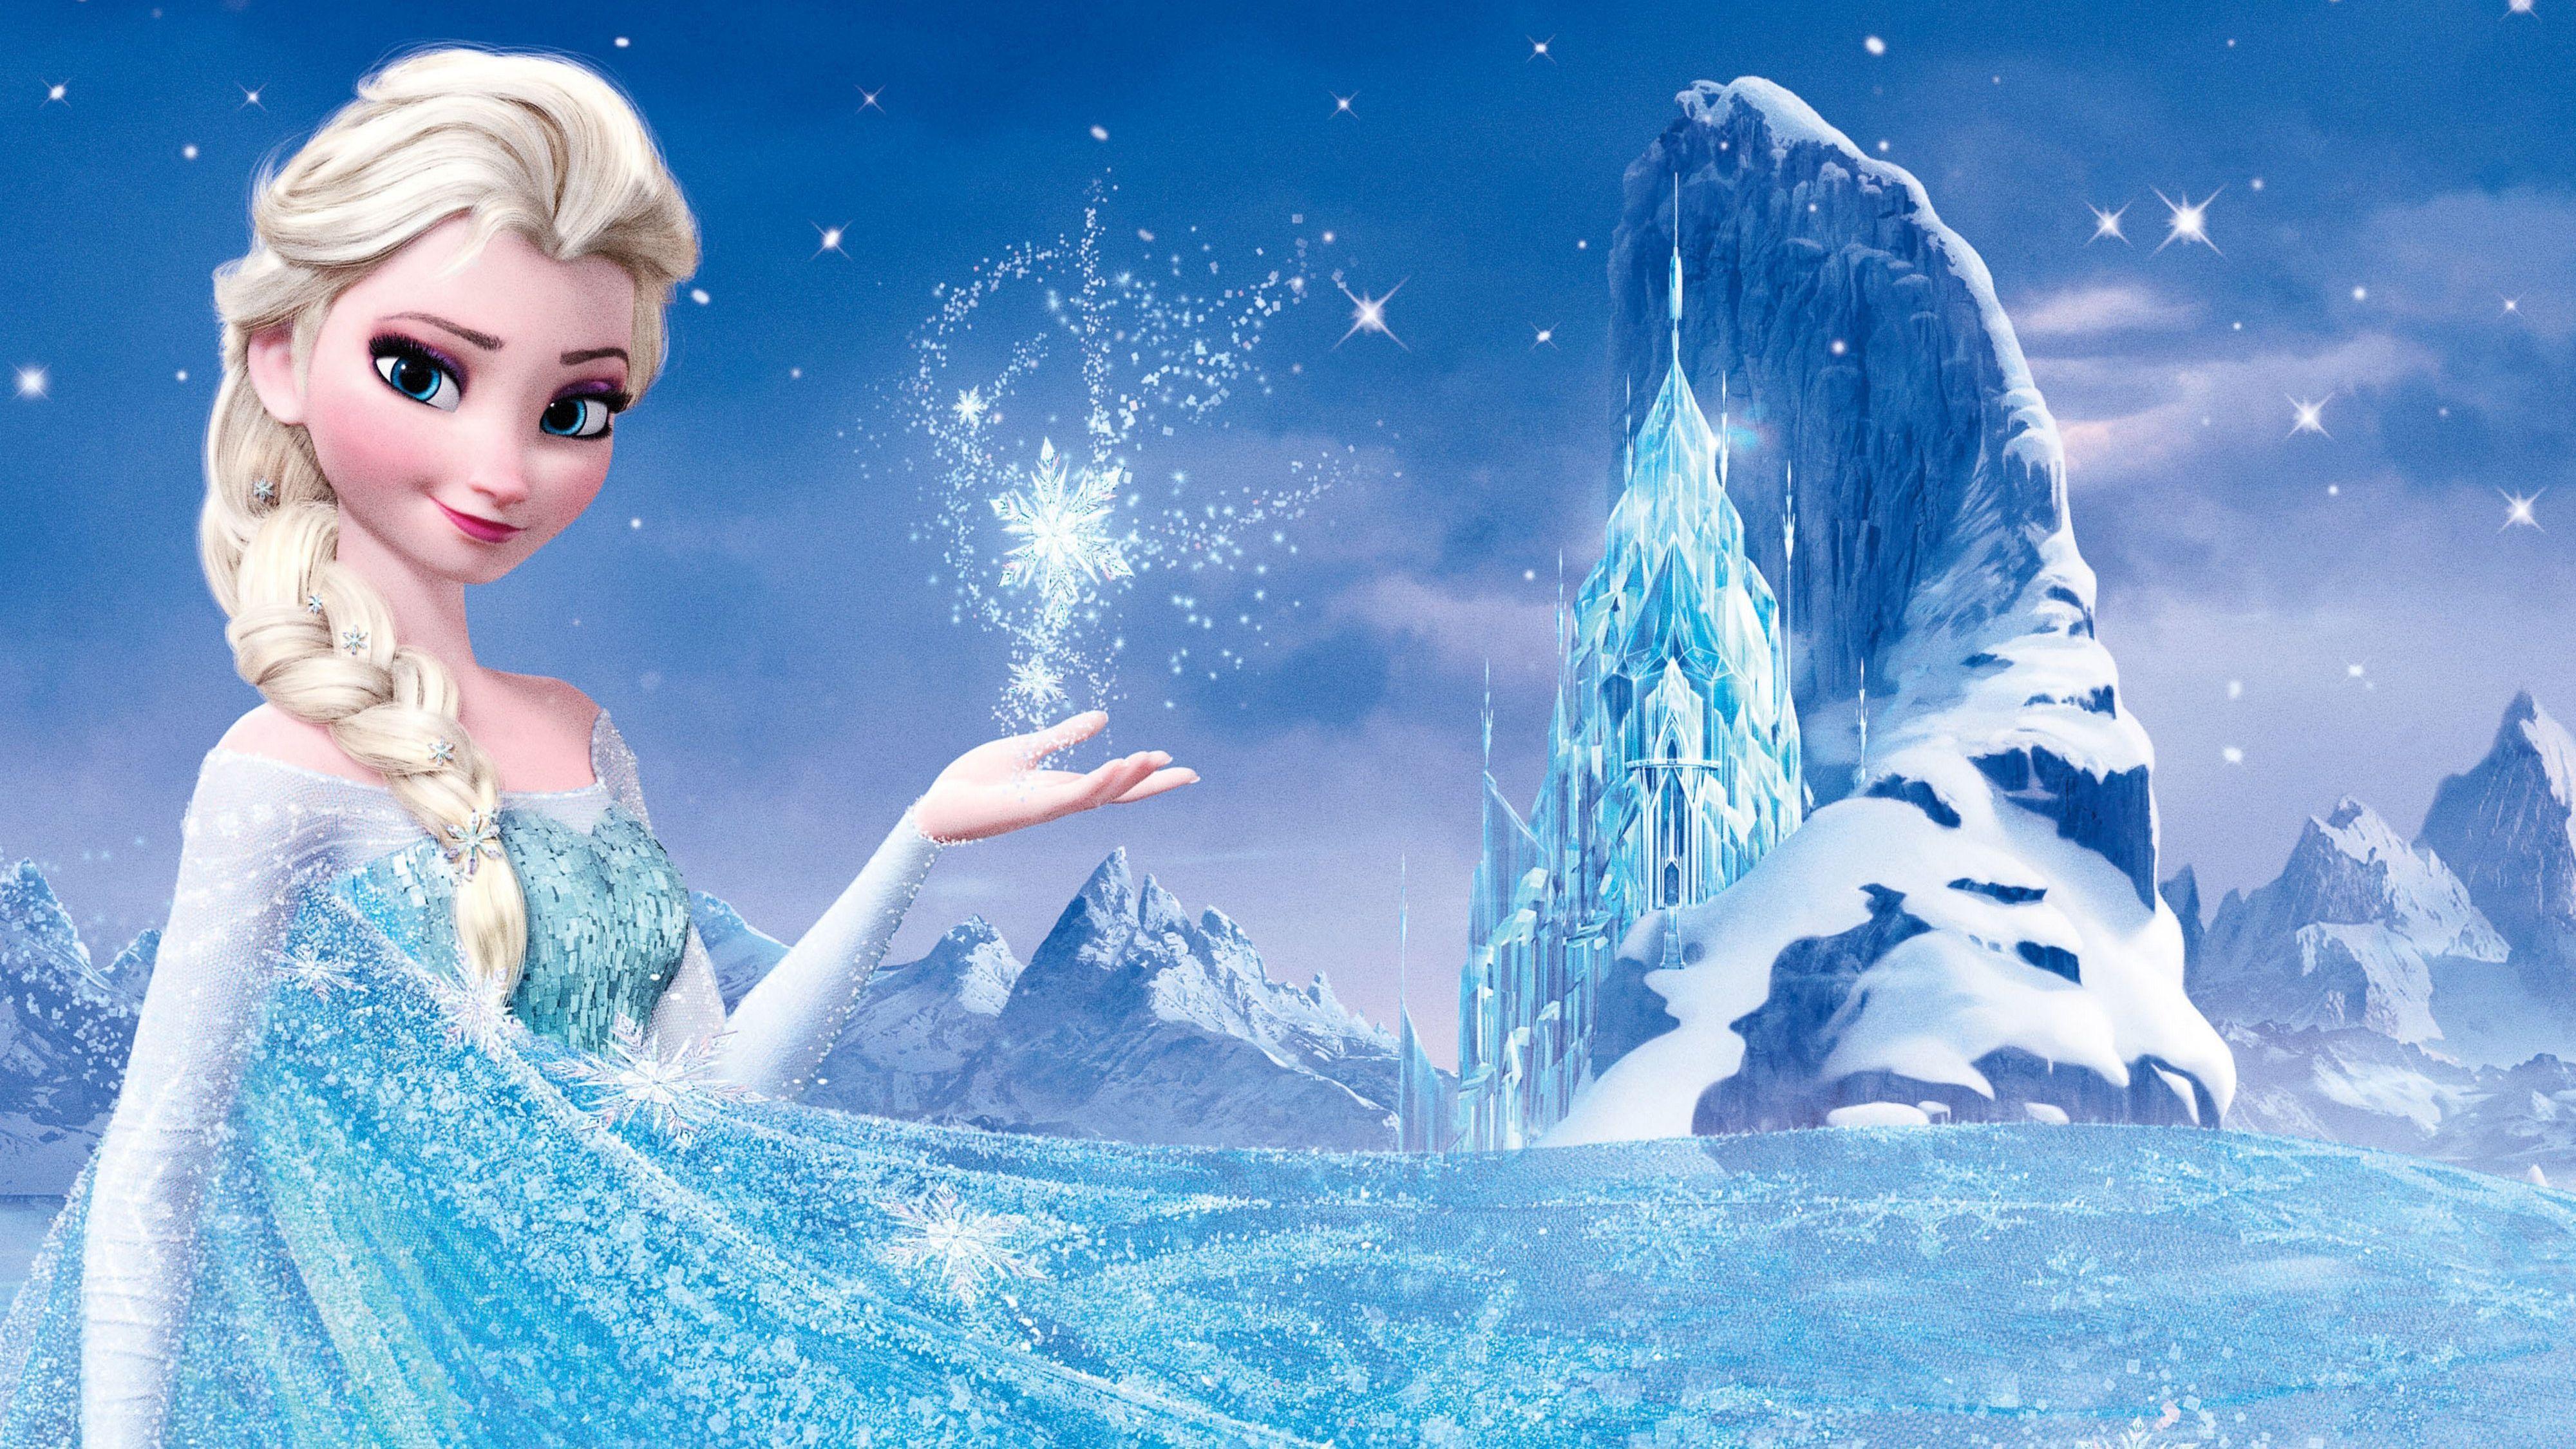 Elsa Wallpapers Top Free Elsa Backgrounds Wallpaperaccess Frozen Wallpaper Elsa Edible Cake Topper Elsa